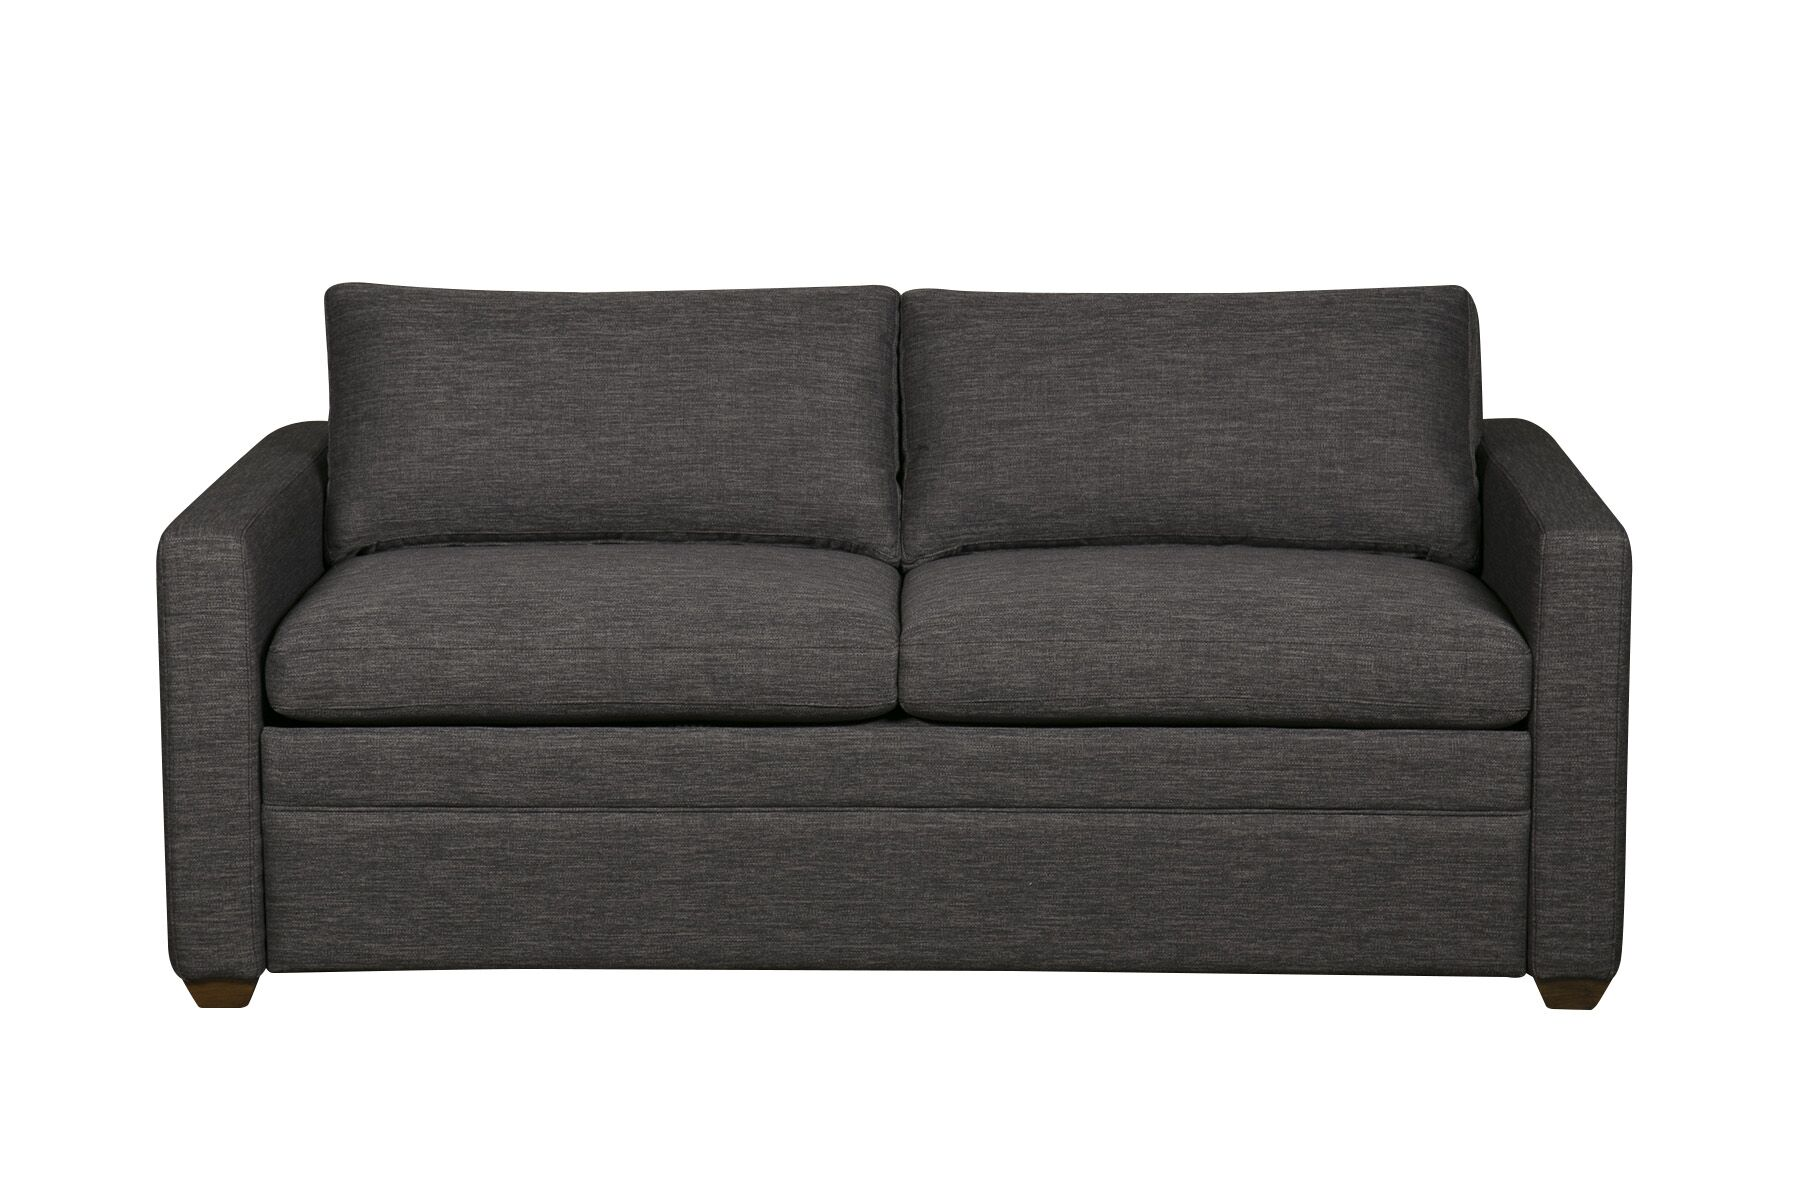 Rolette Sleeper Sofa Upholstery: Charcoal, Mattress Type: Full